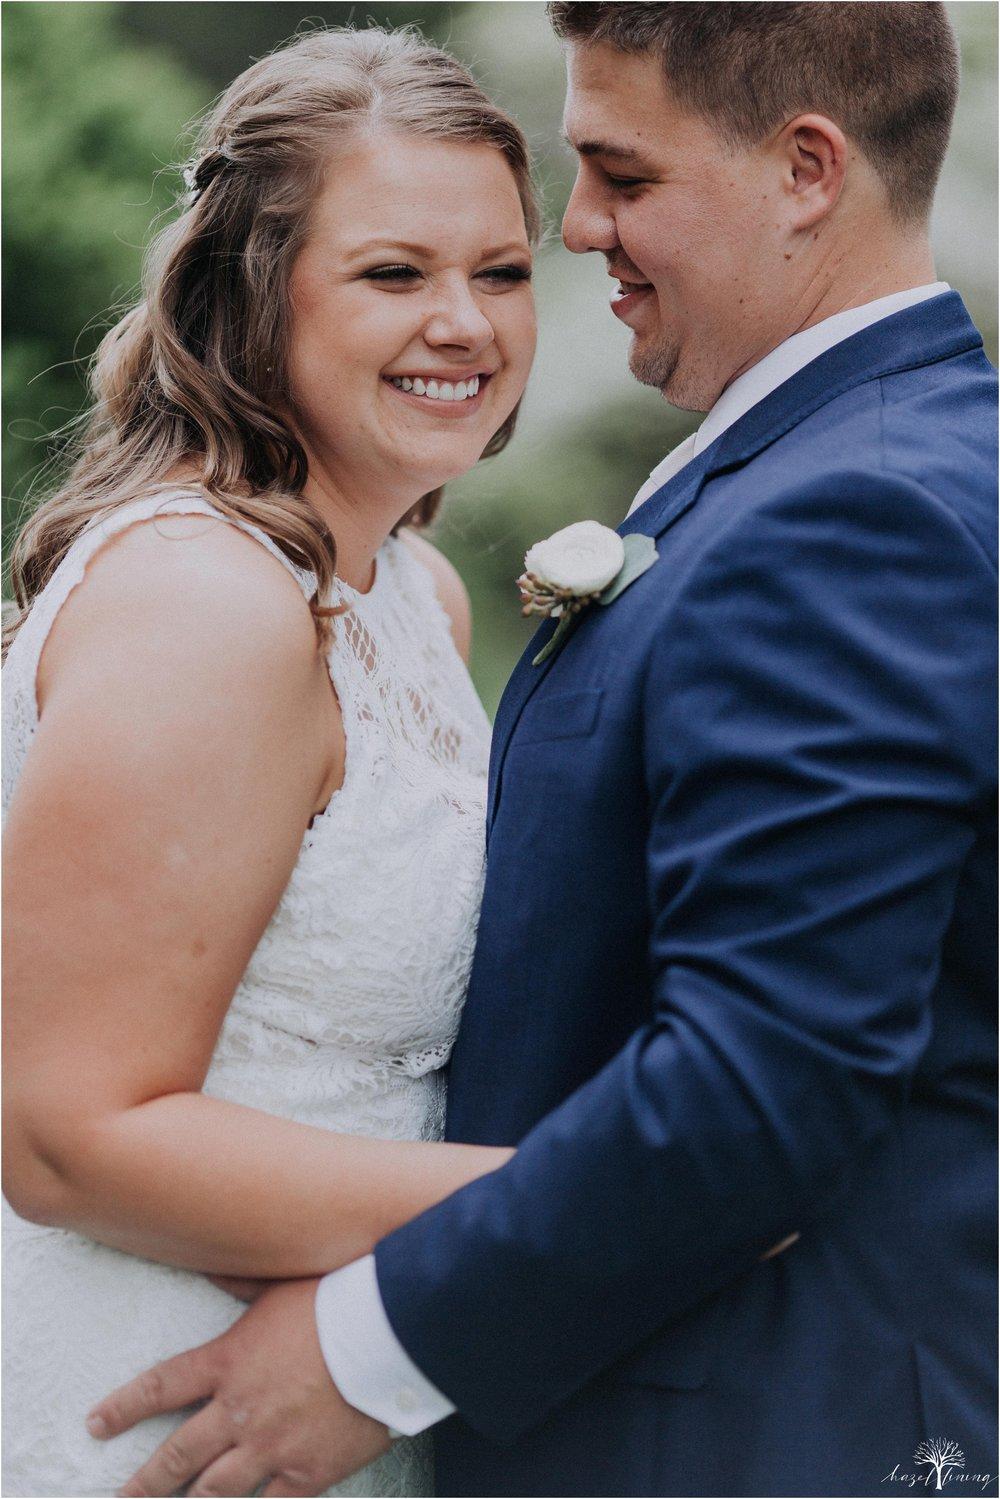 hazel-lining-travel-wedding-elopement-photography-abby-skyler-hunt-the-willis-house-york-pennsylvania-outdoor-estate-wedding_0039.jpg